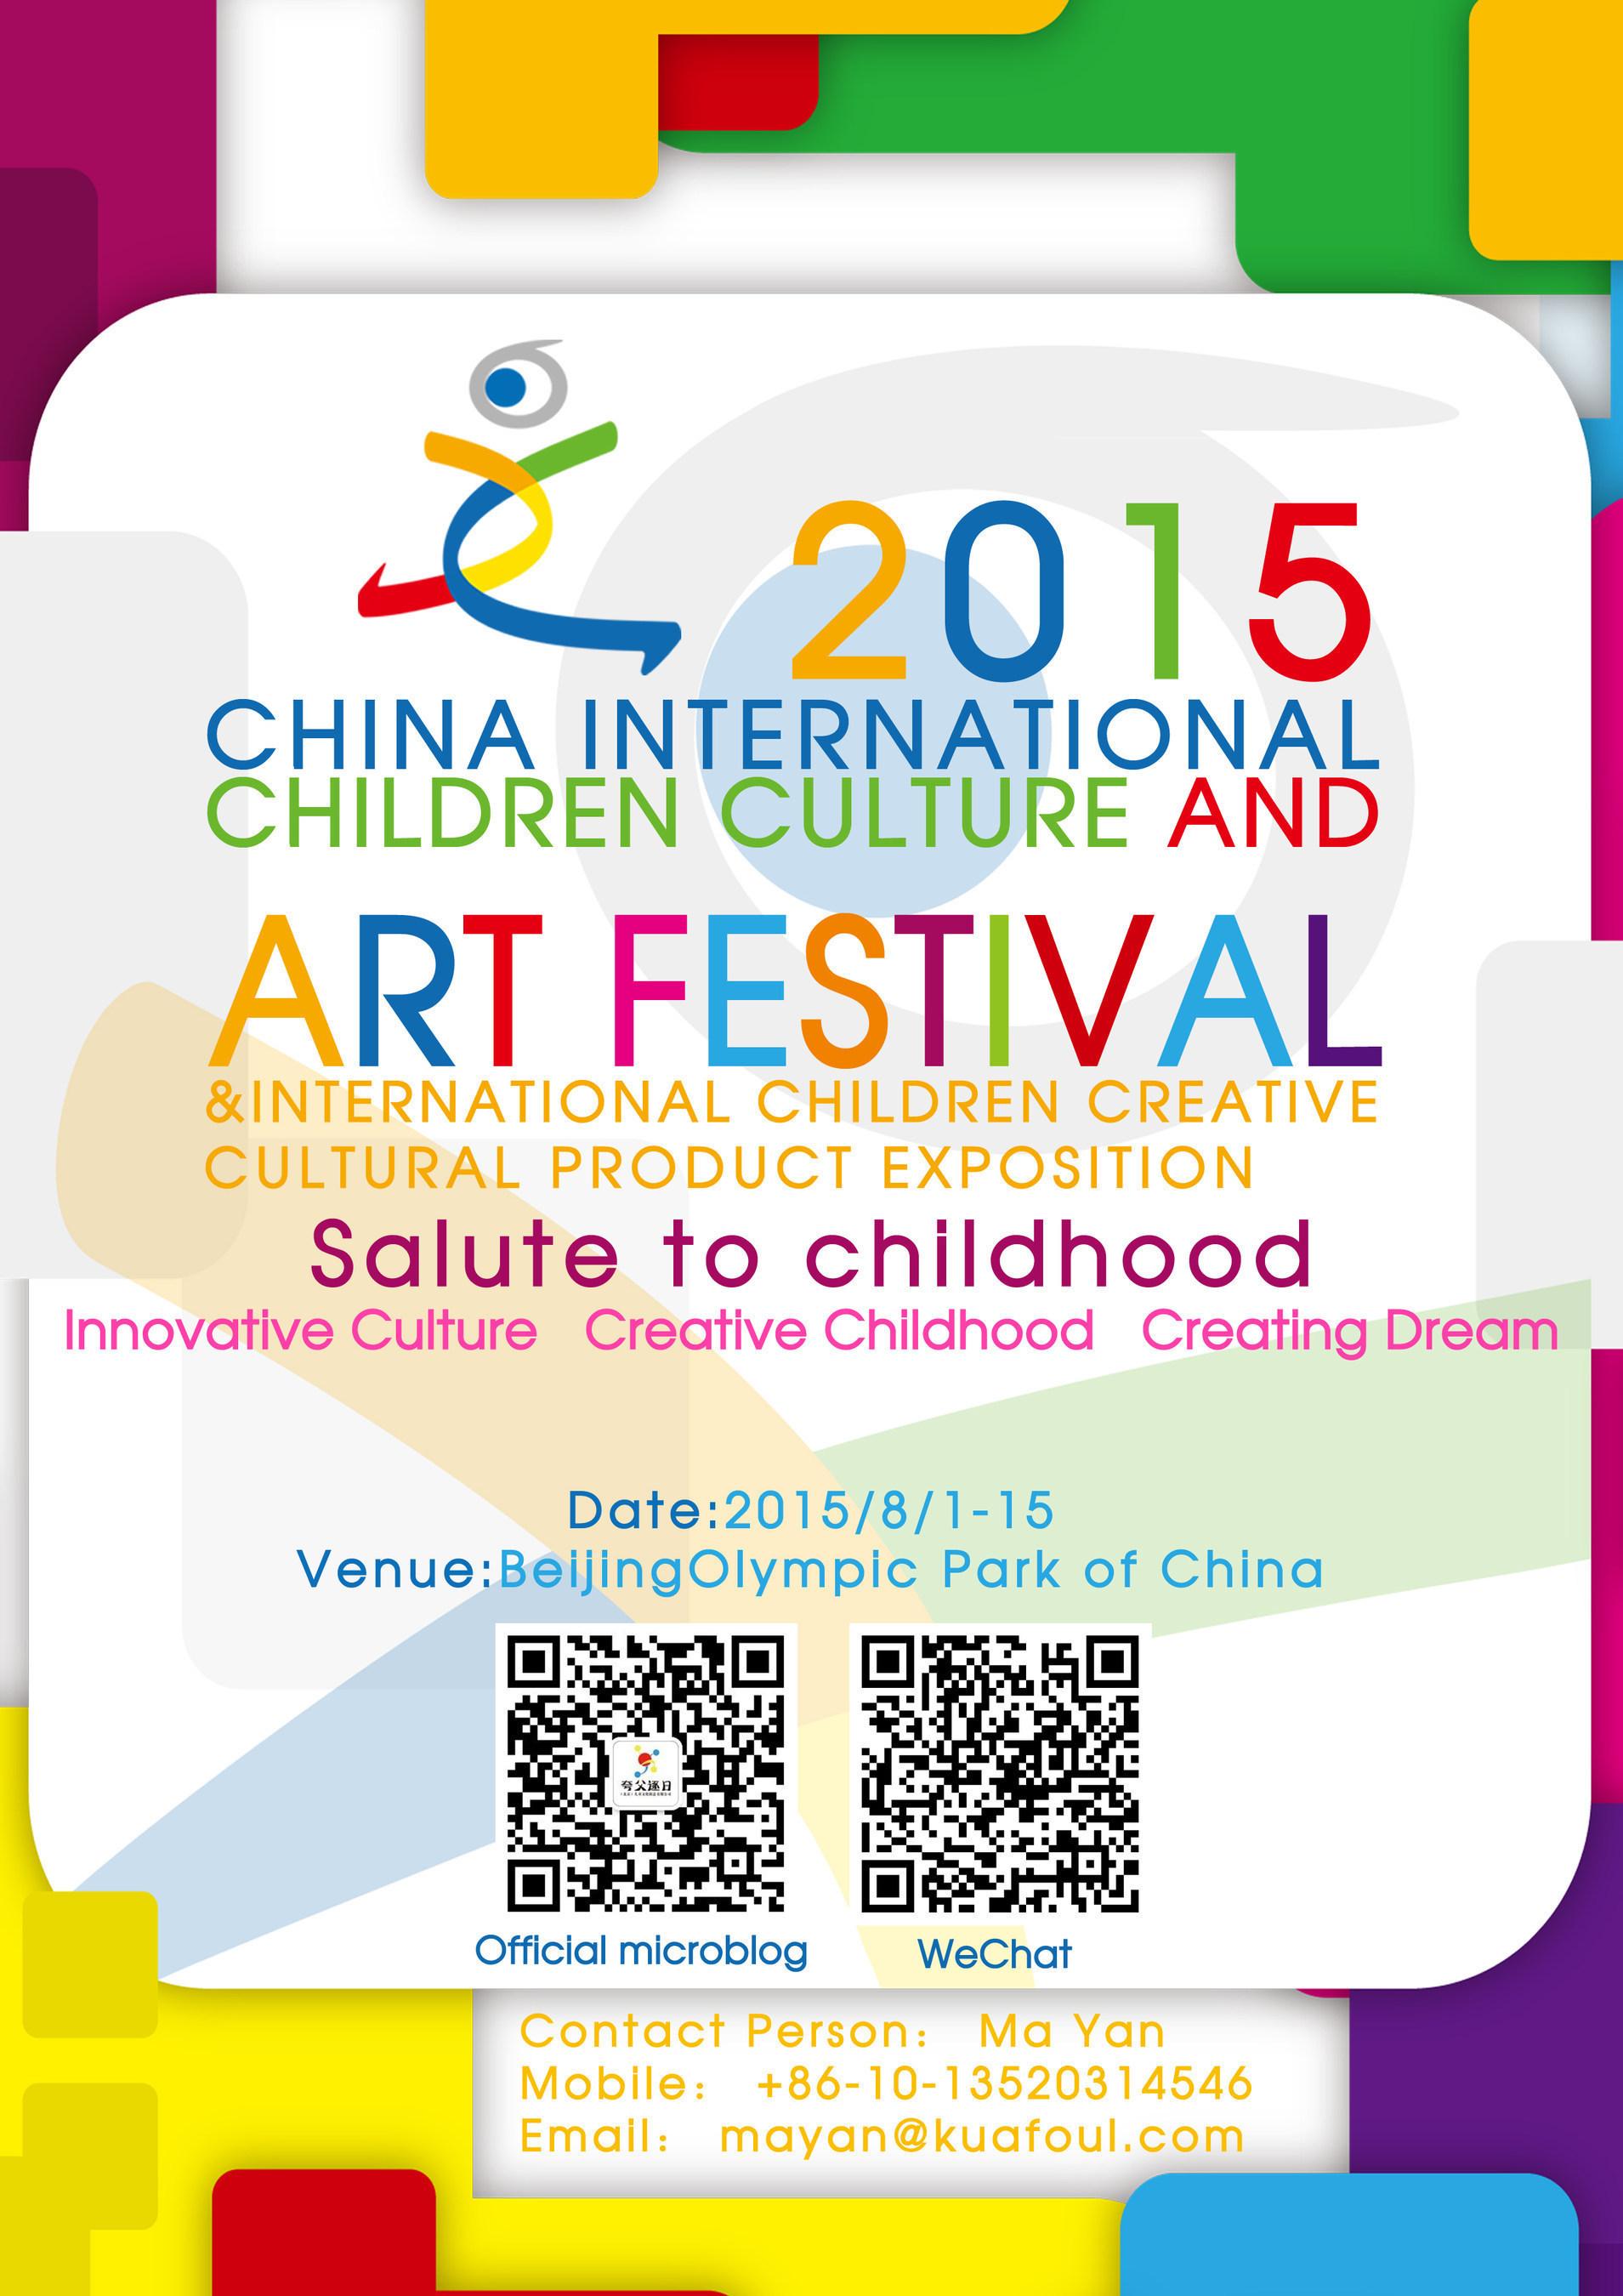 2015 China International Children Culture and Art Festival.